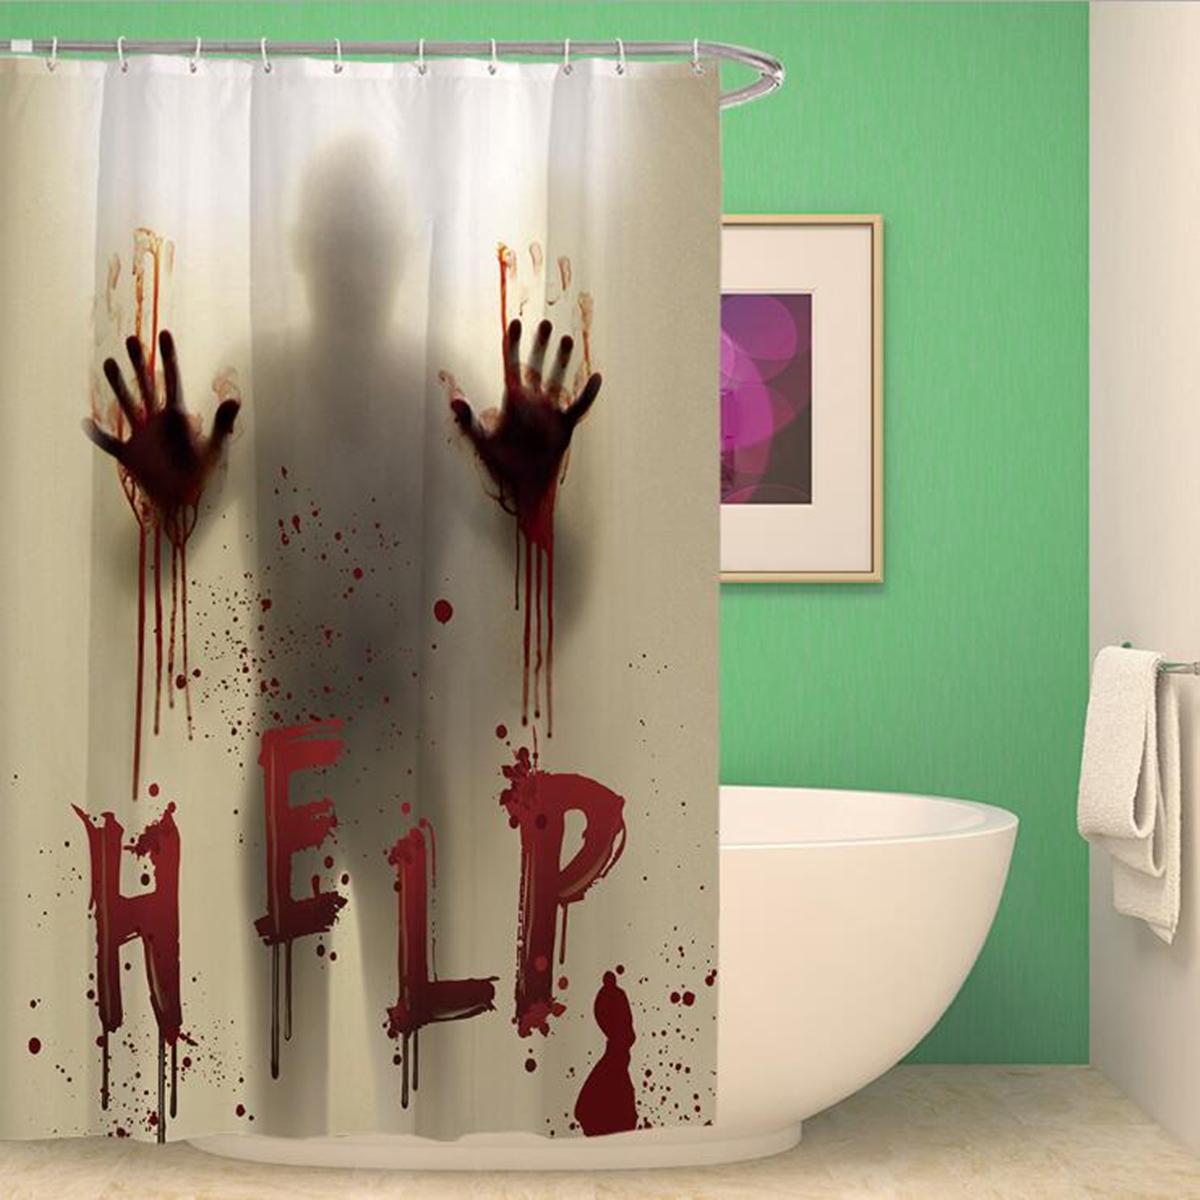 halloween horror bloody hands helps waterproof shower curtains bathroom decor